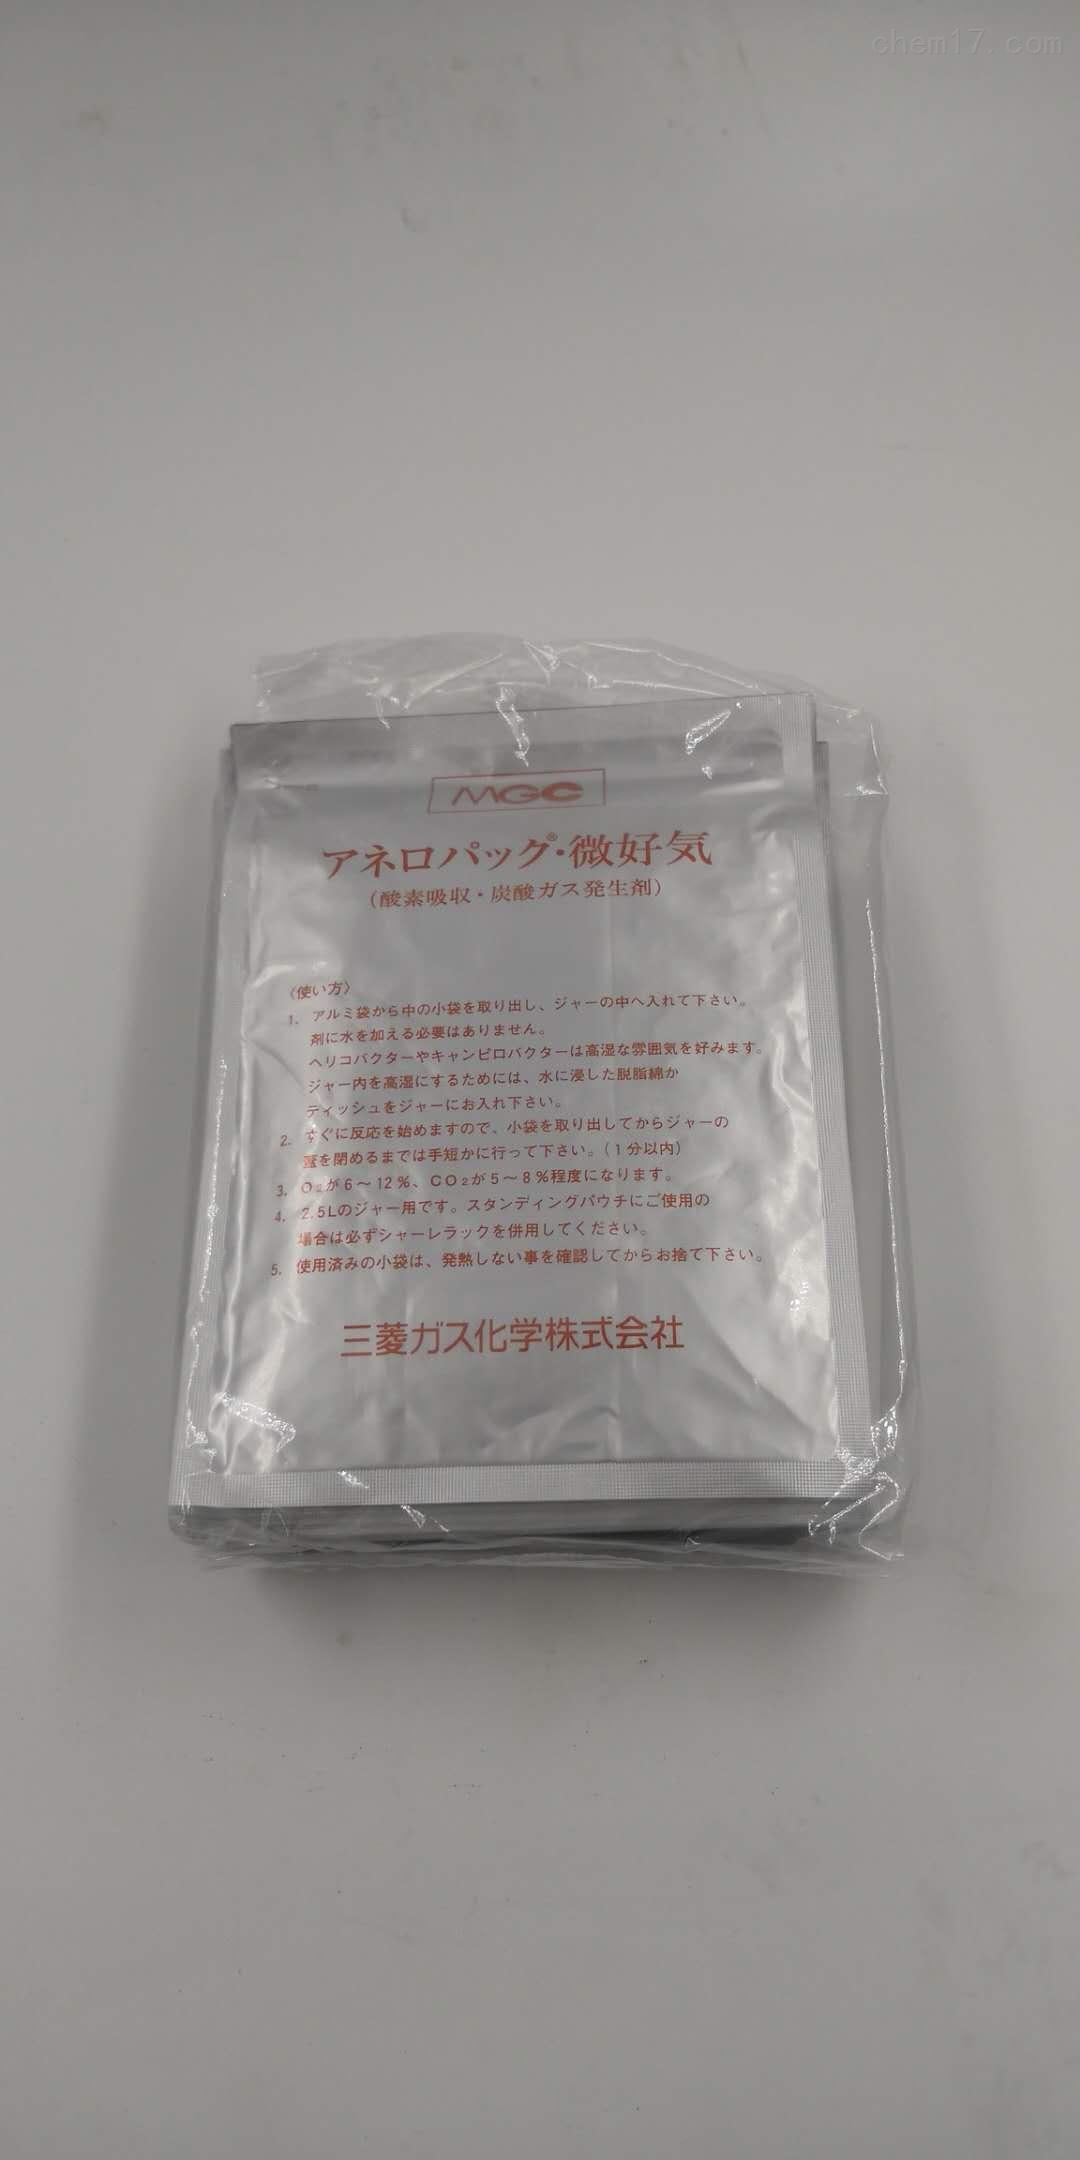 2.5L微需氧产气袋日本三菱MGC微生物厌氧